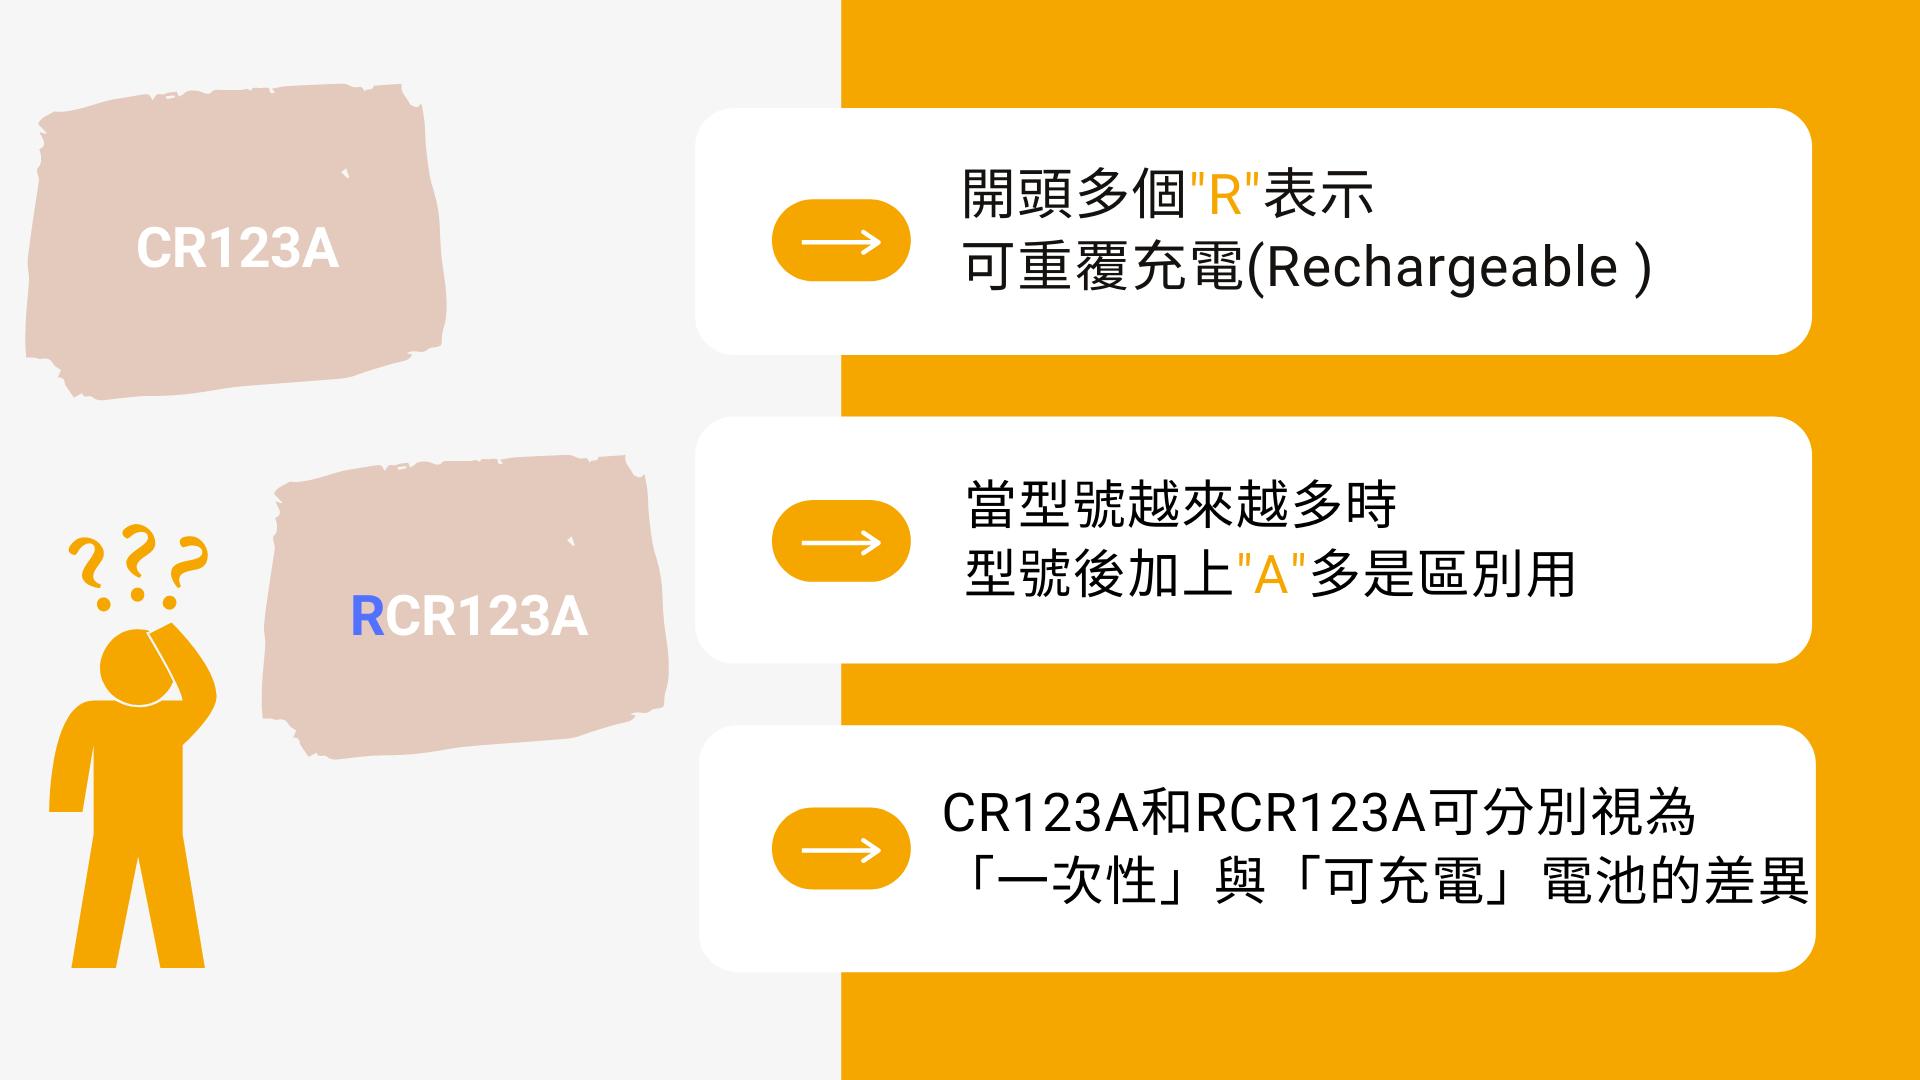 CR123A 一次性電池 RCR123A 可充電鋰電池